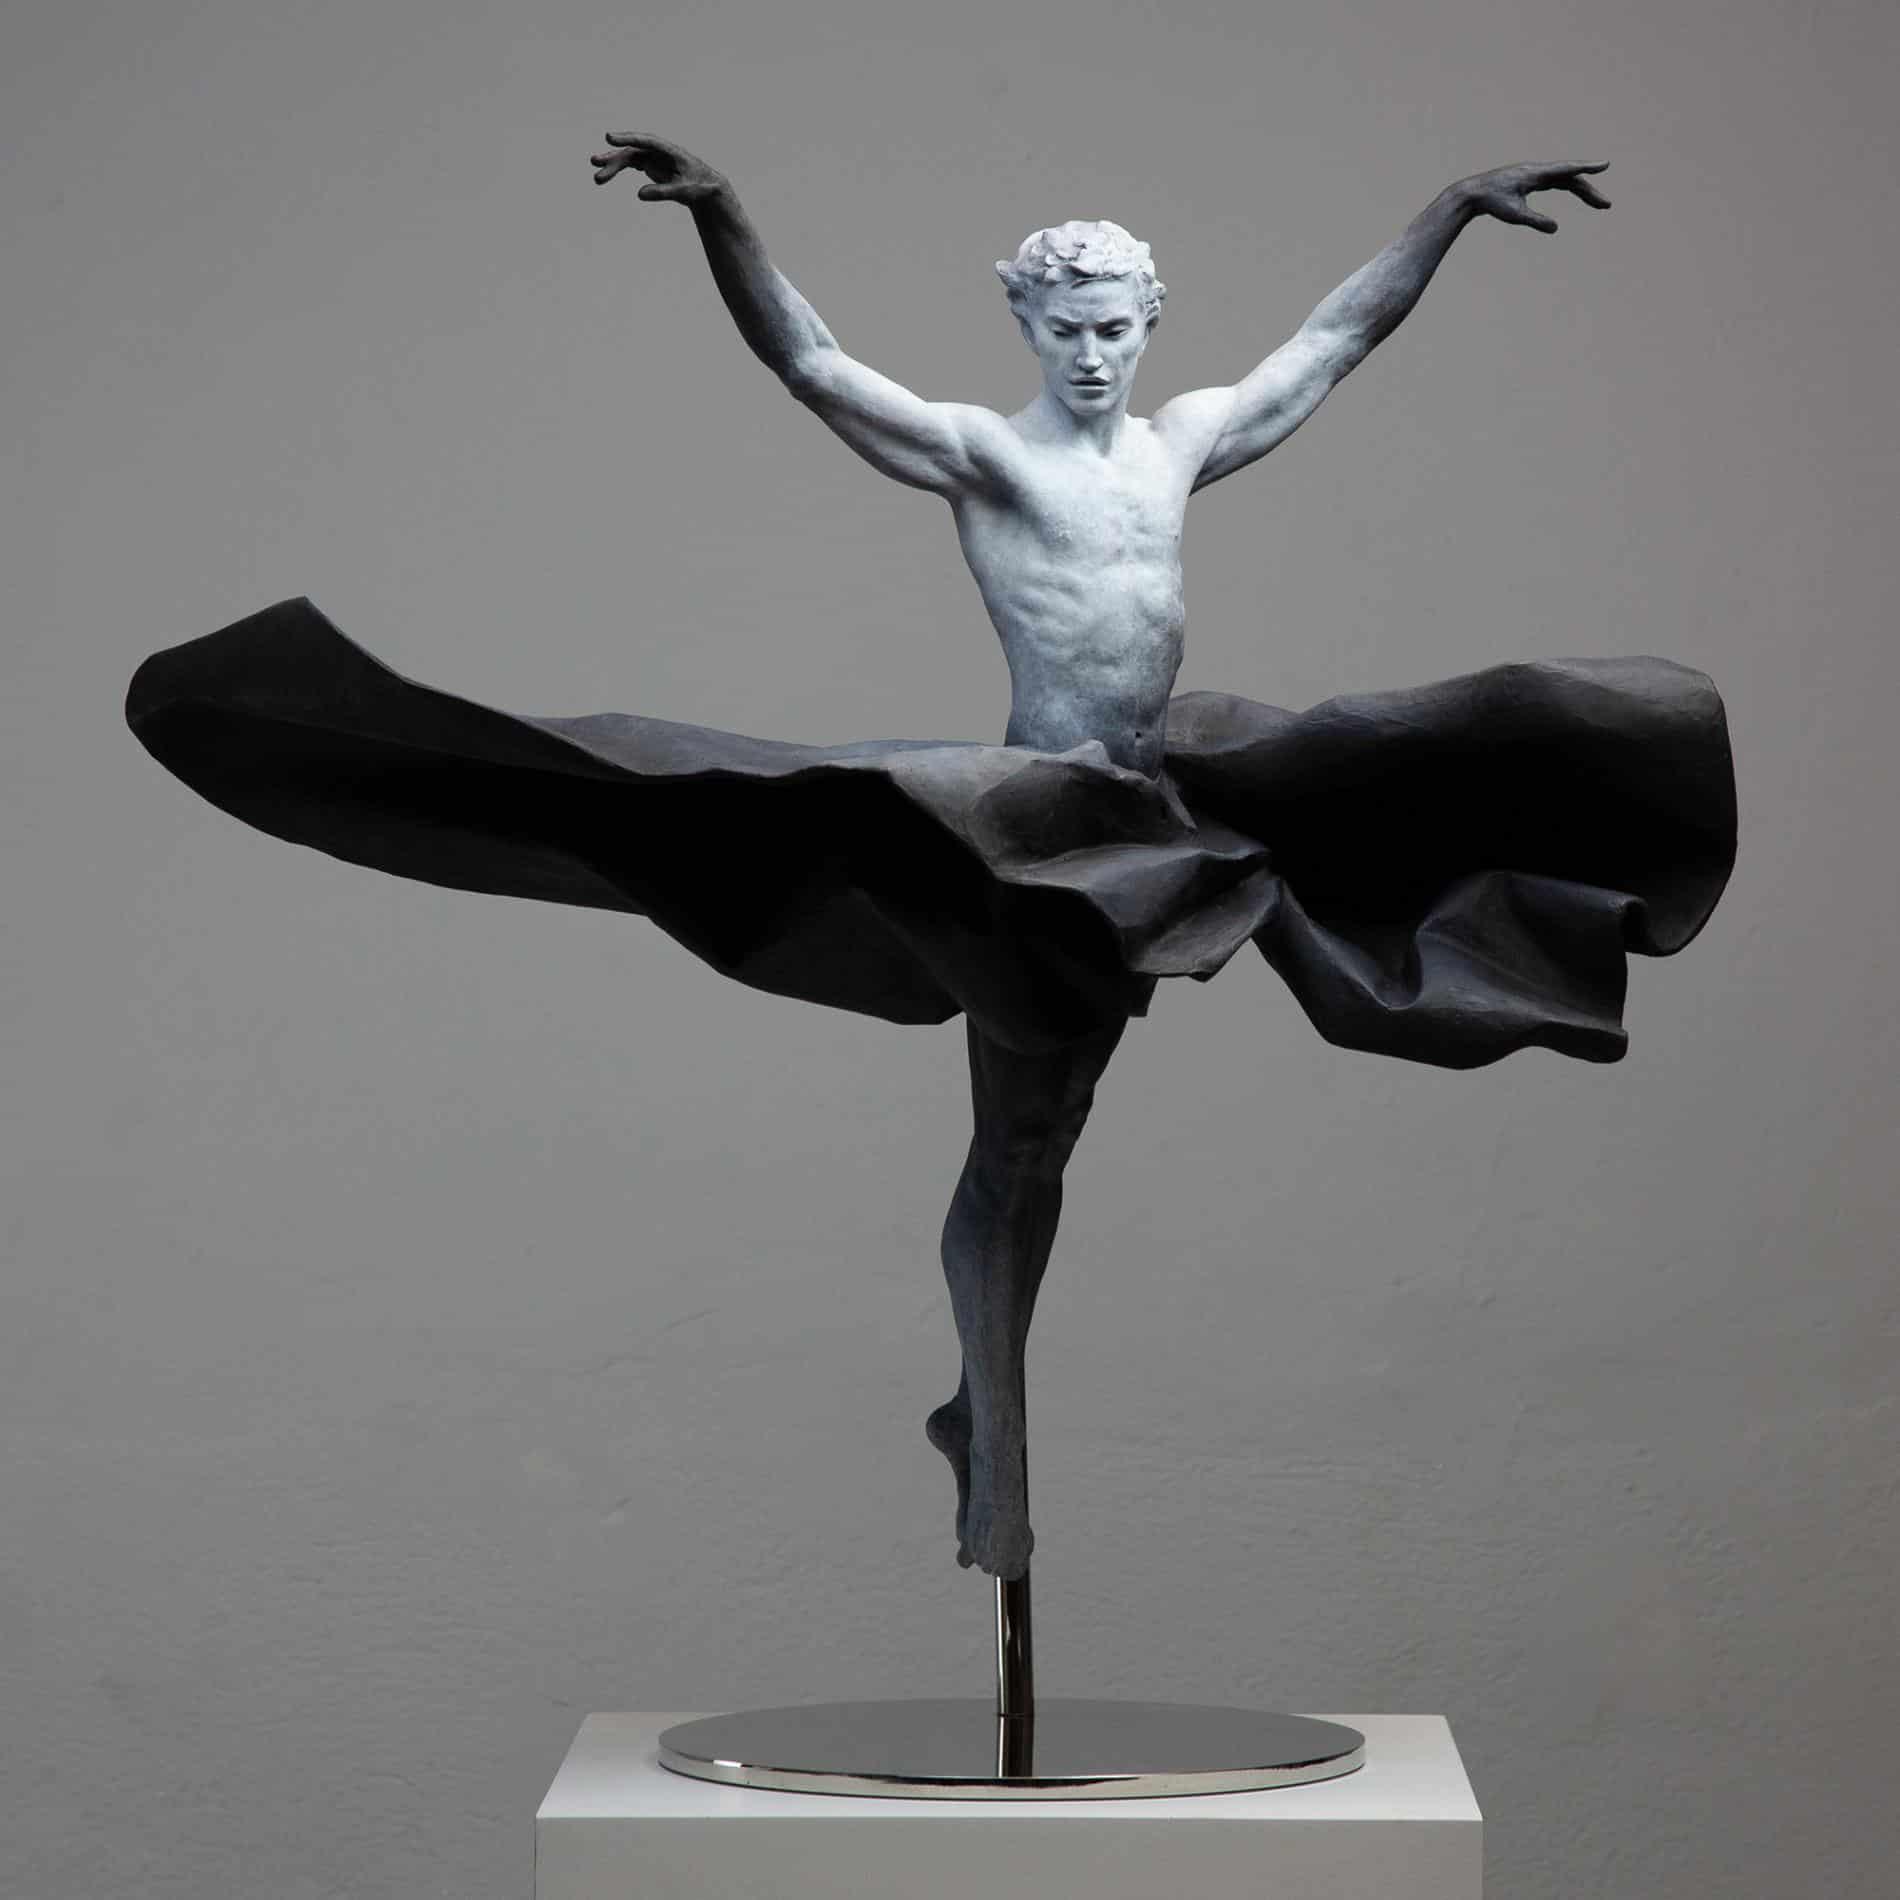 escultura coderechmalavia Moonlight Shadow